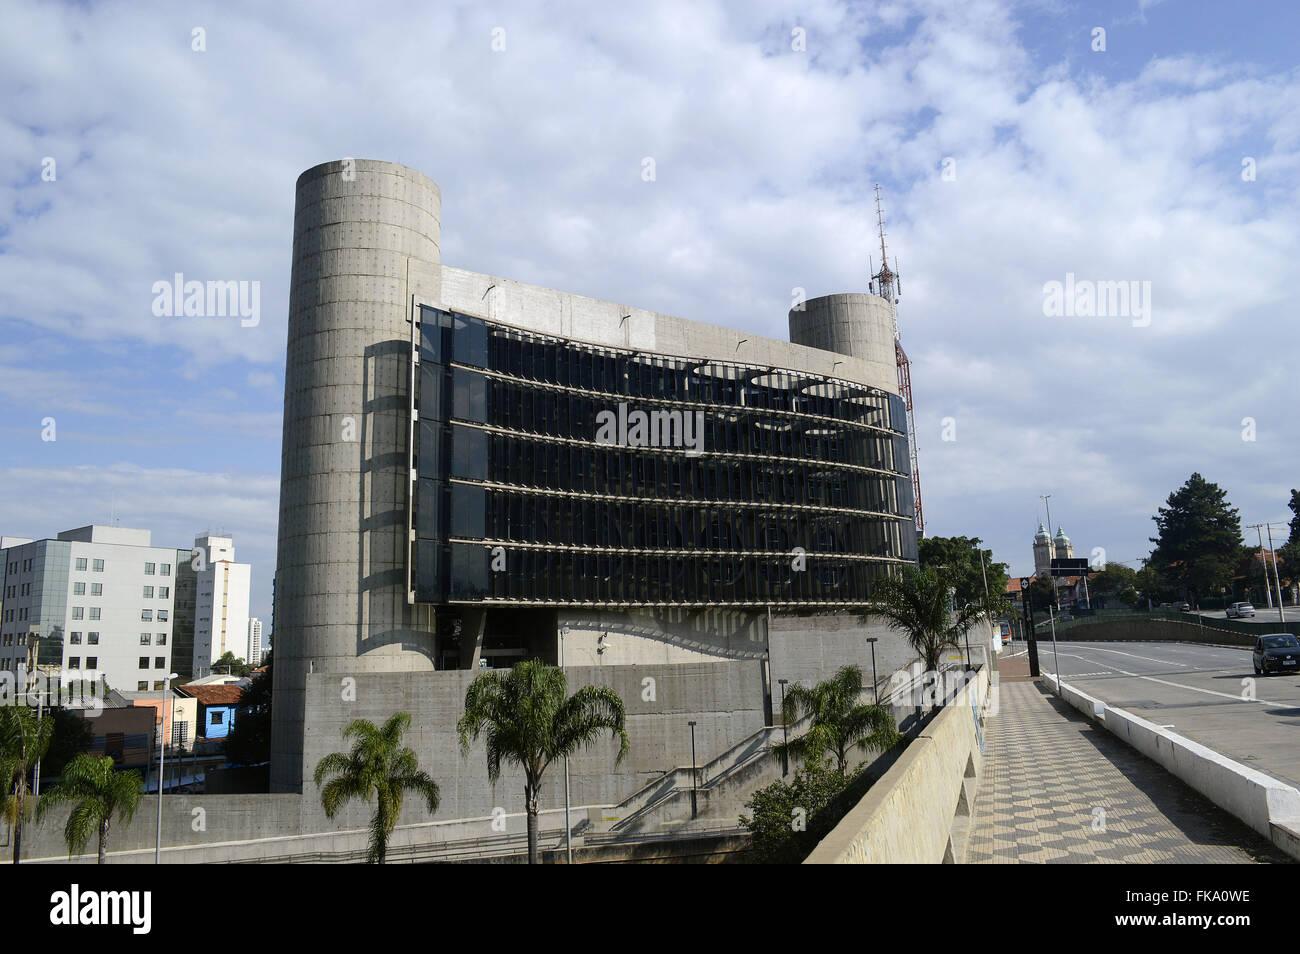 Centro da Cultura Judaica ou Casa de Cultura de Israel - Stock Image